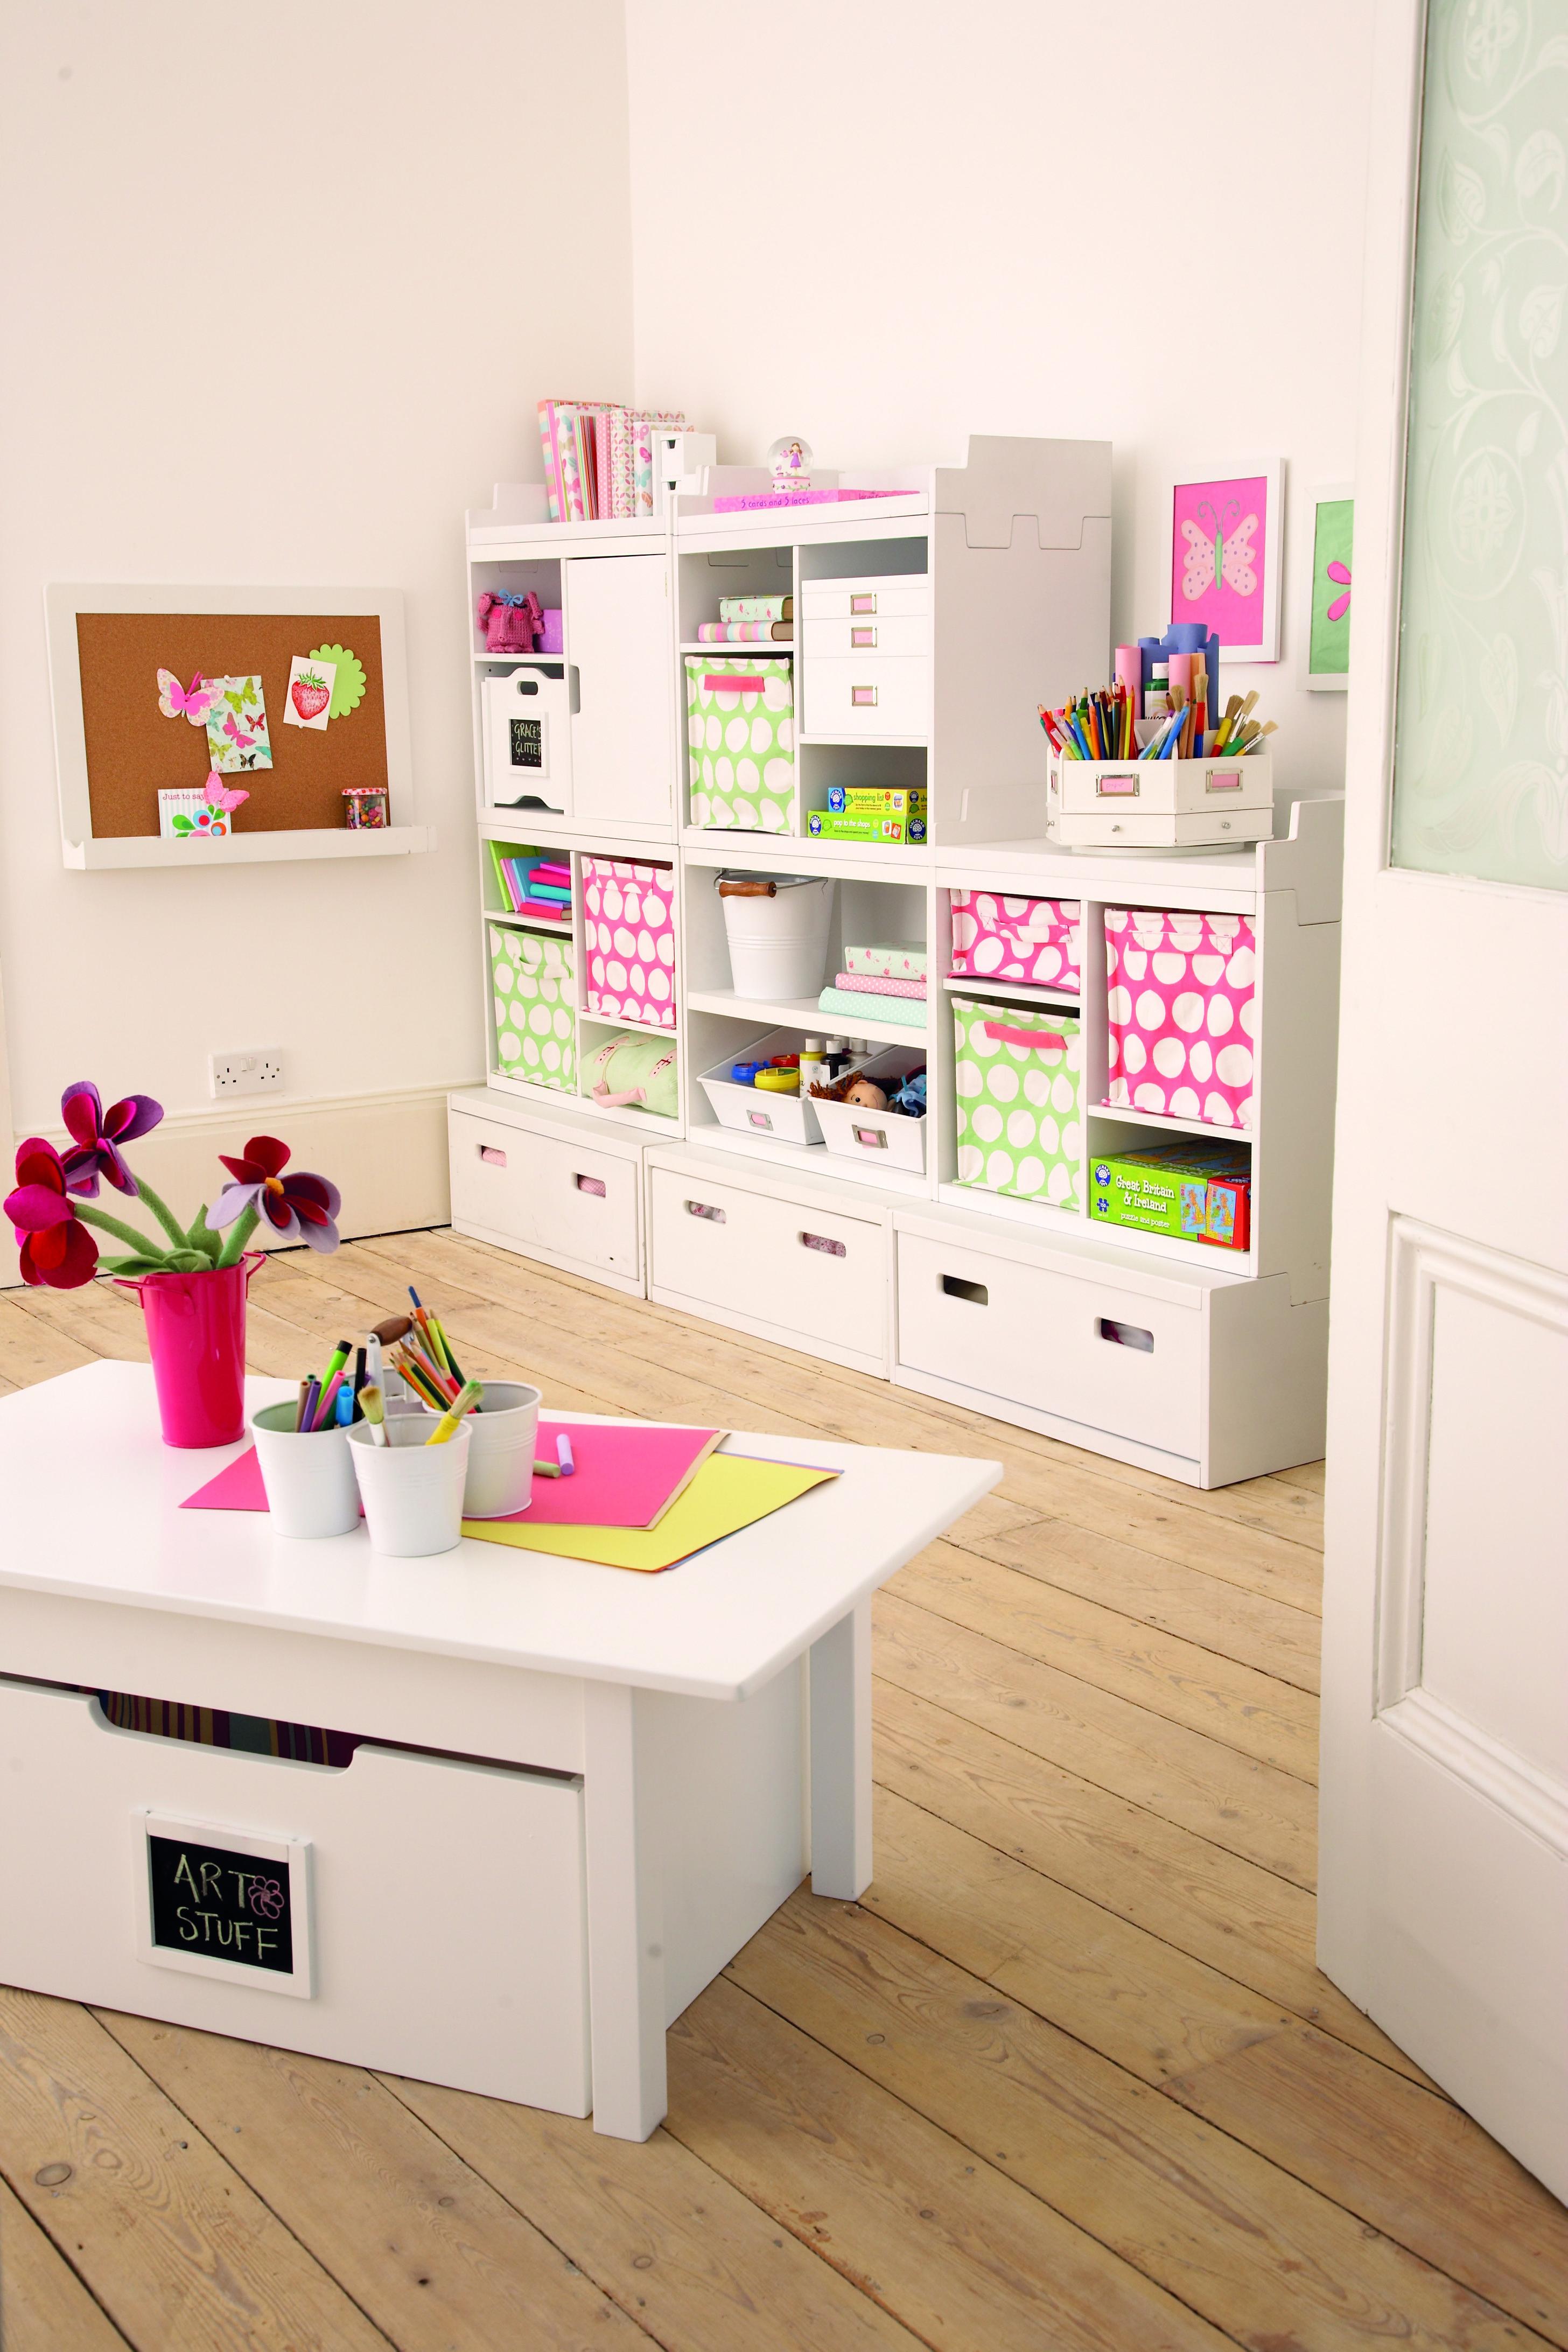 modular storage 1 door cupboard unit for children in s a